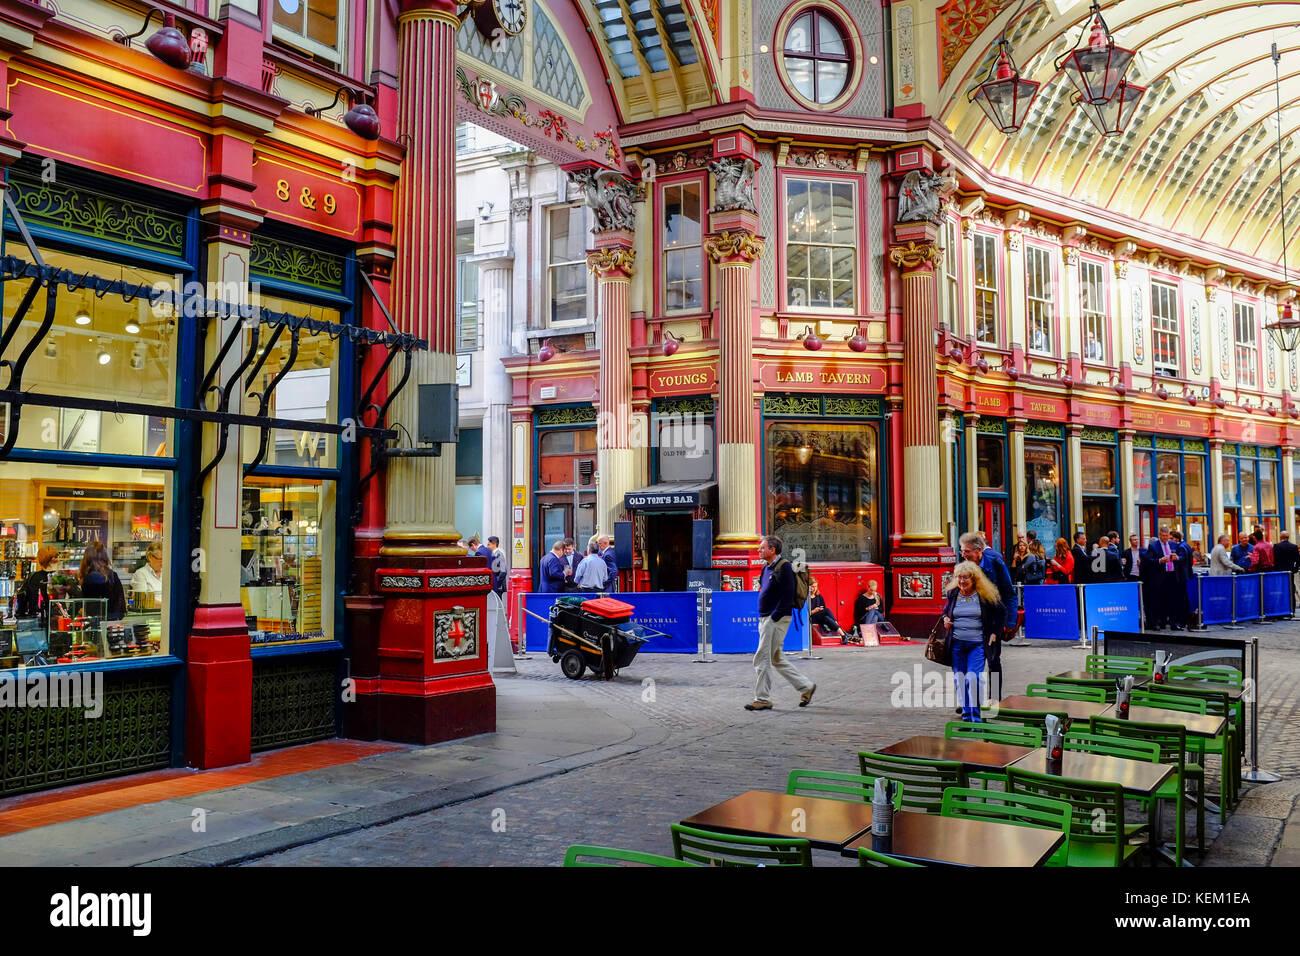 Leadenhall Market, City of London, London, England, United Kingdom, Europe - Stock Image